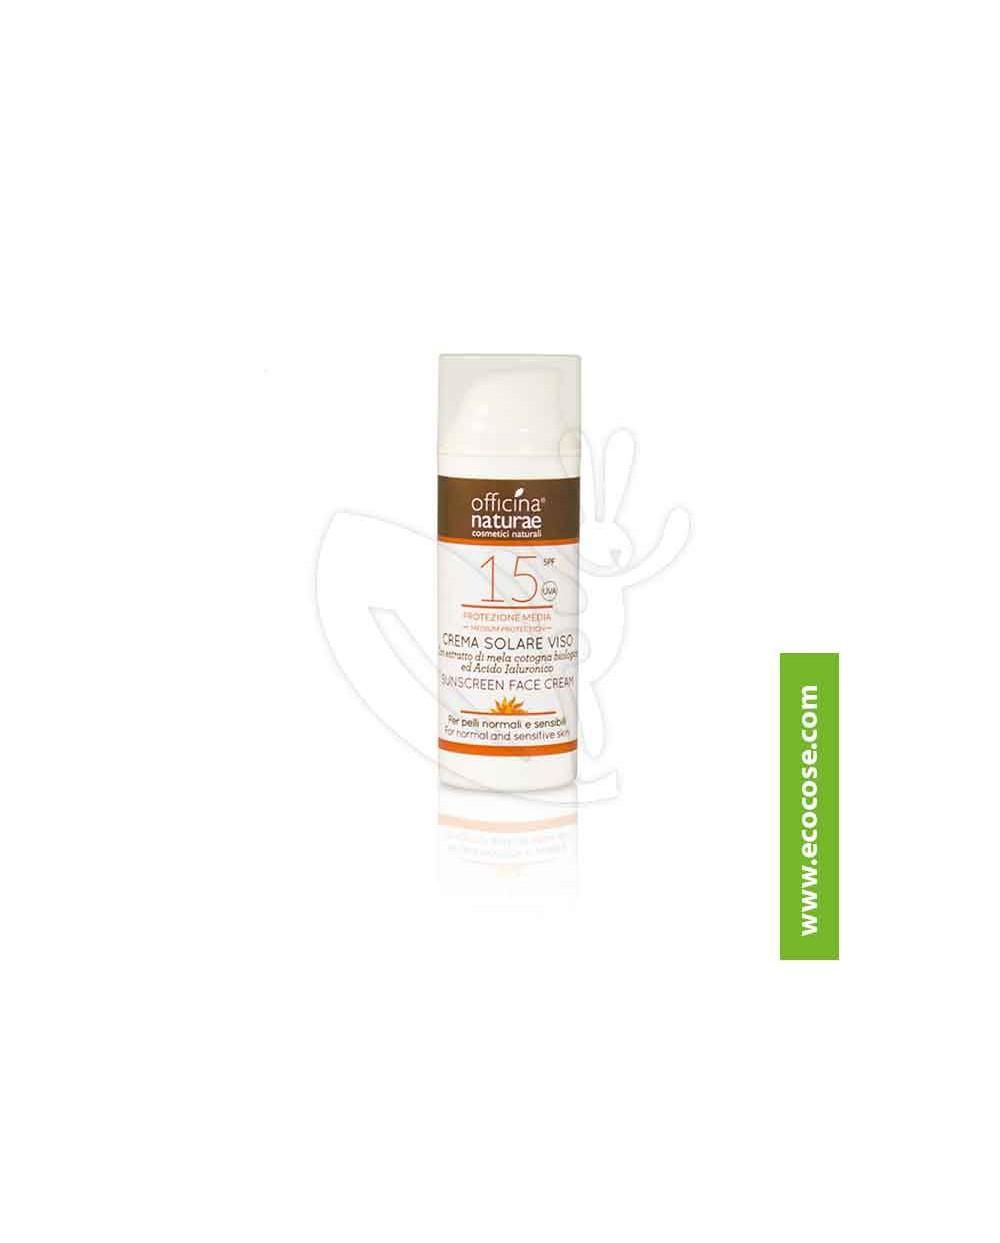 Officina Naturae - Crema Solare Viso SPF 15 Protez. media - AIRLESS